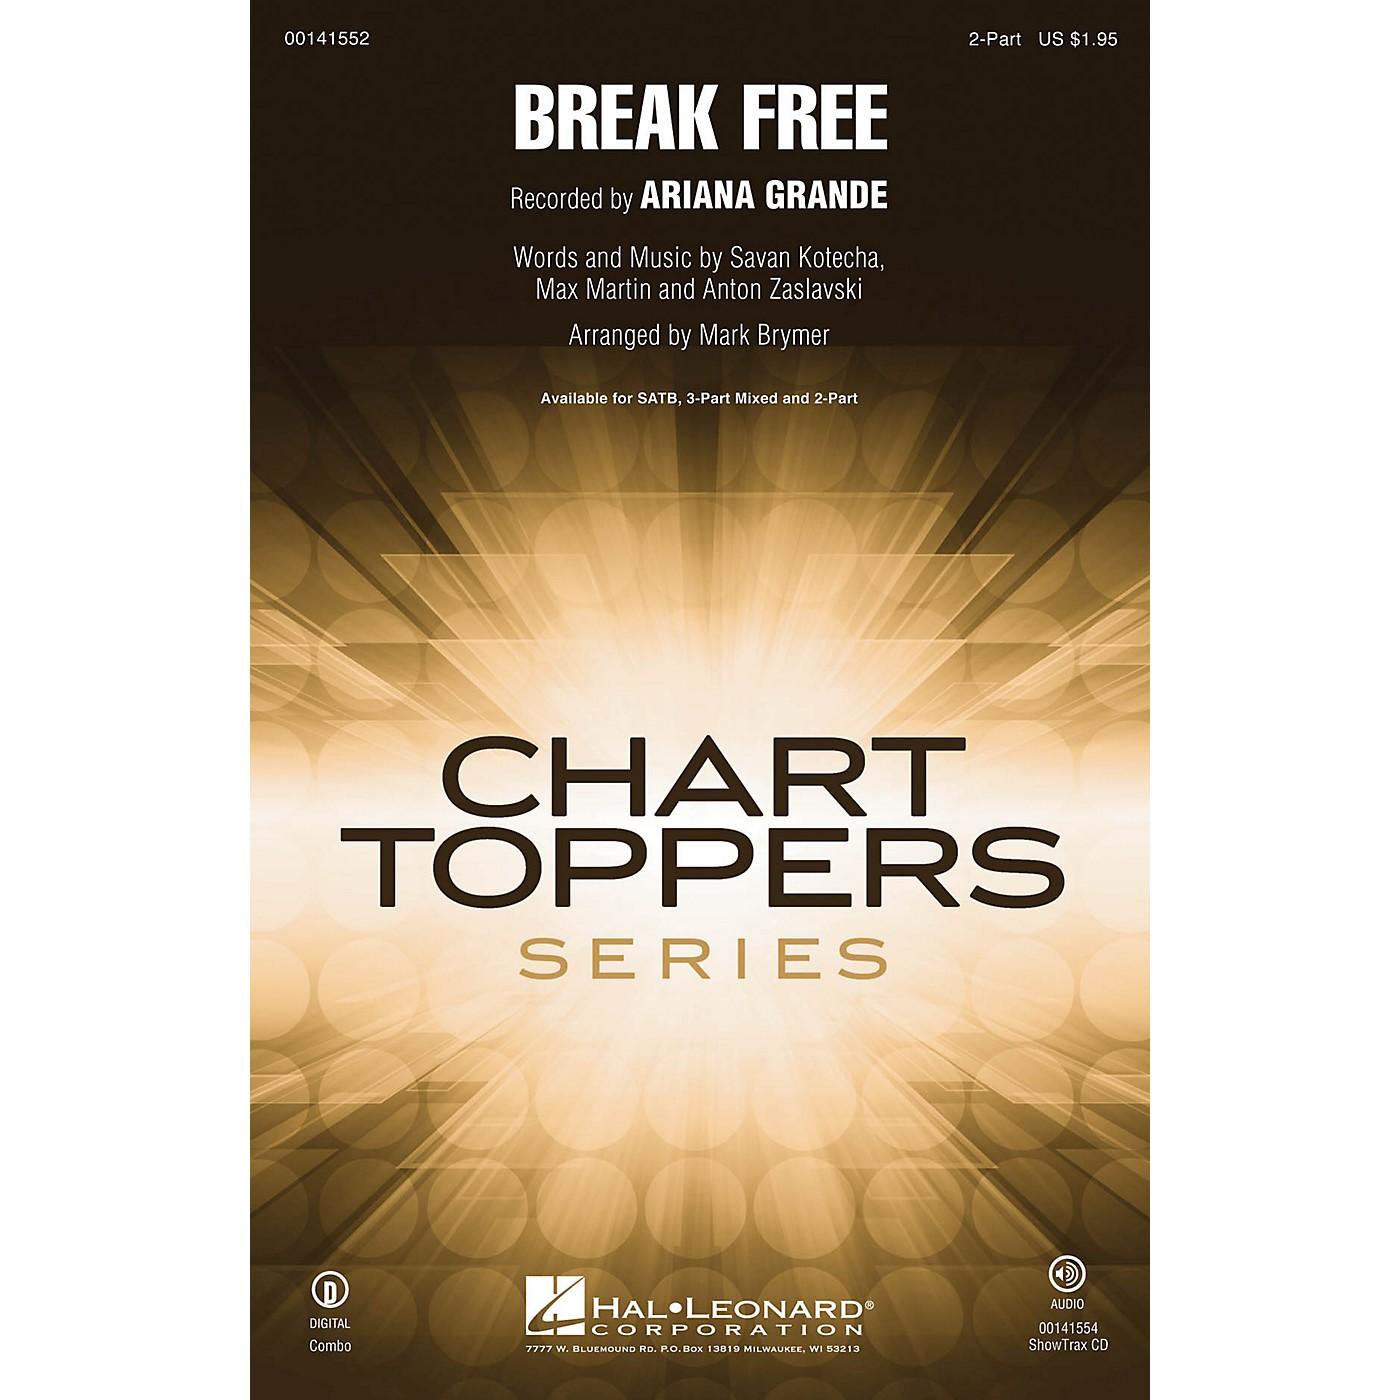 Hal Leonard Break Free 2-Part by Ariana Grande arranged by Mark Brymer thumbnail